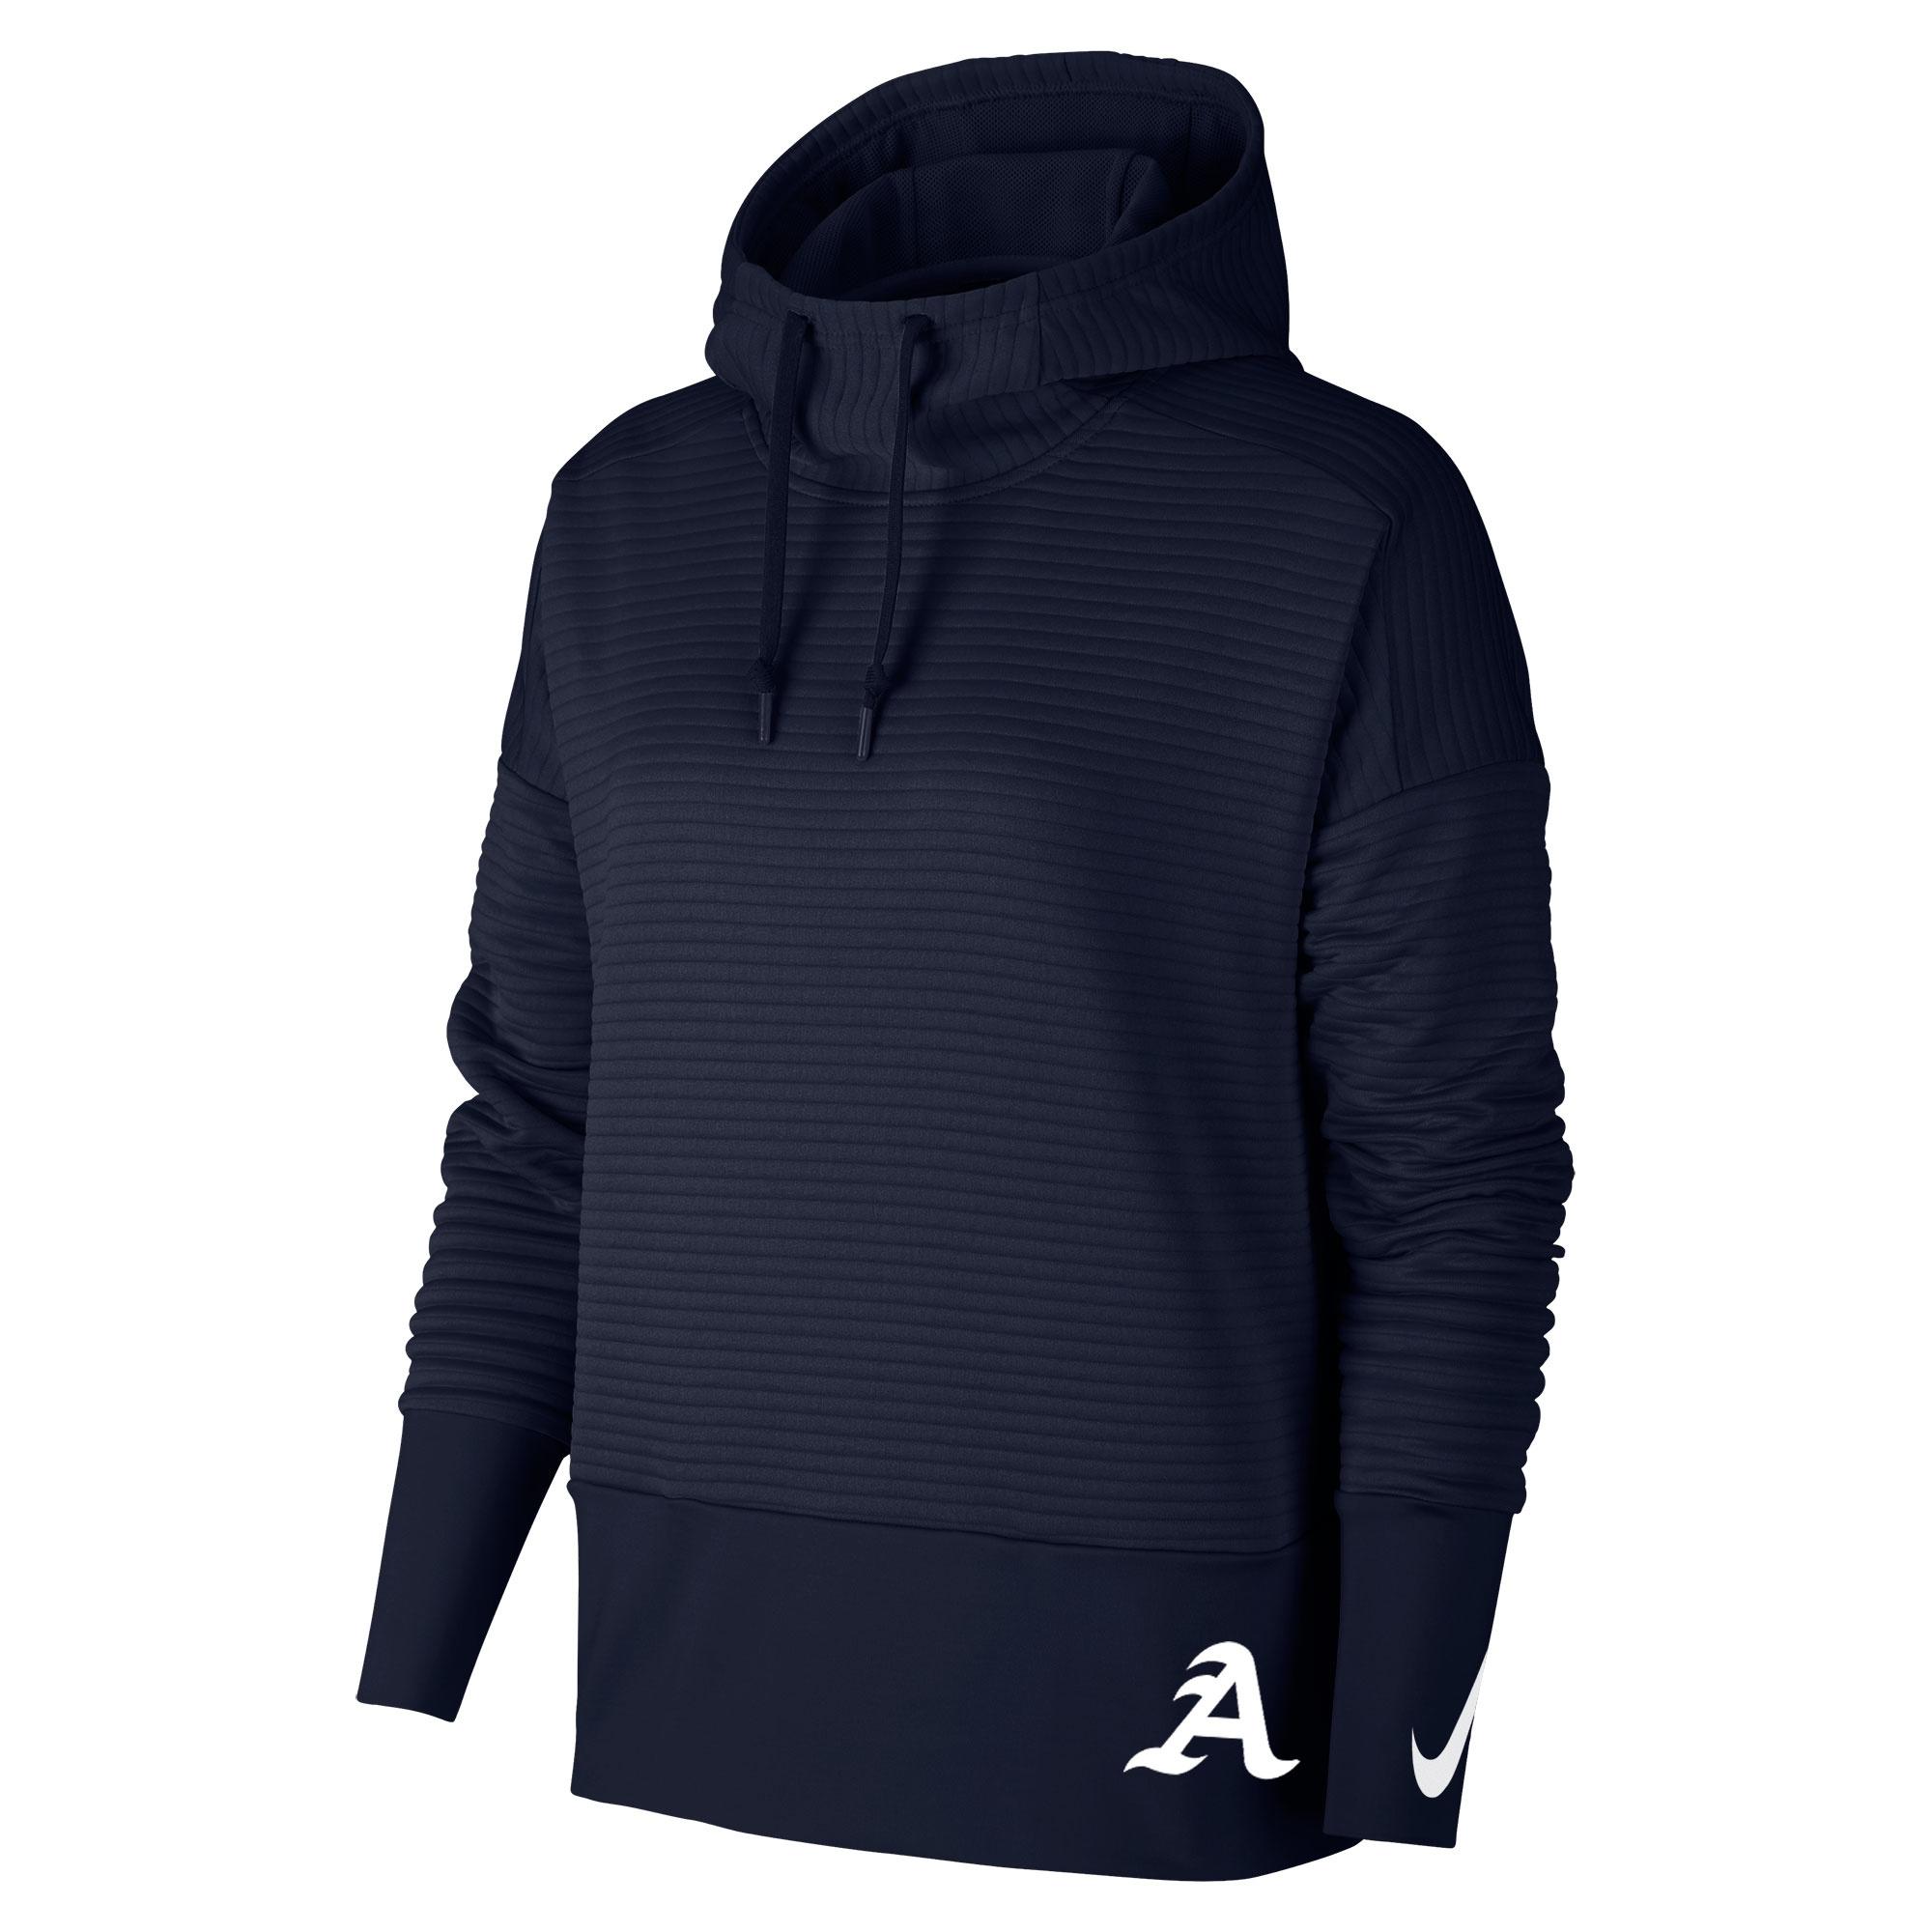 Nike Nike Double Fleece Pullover